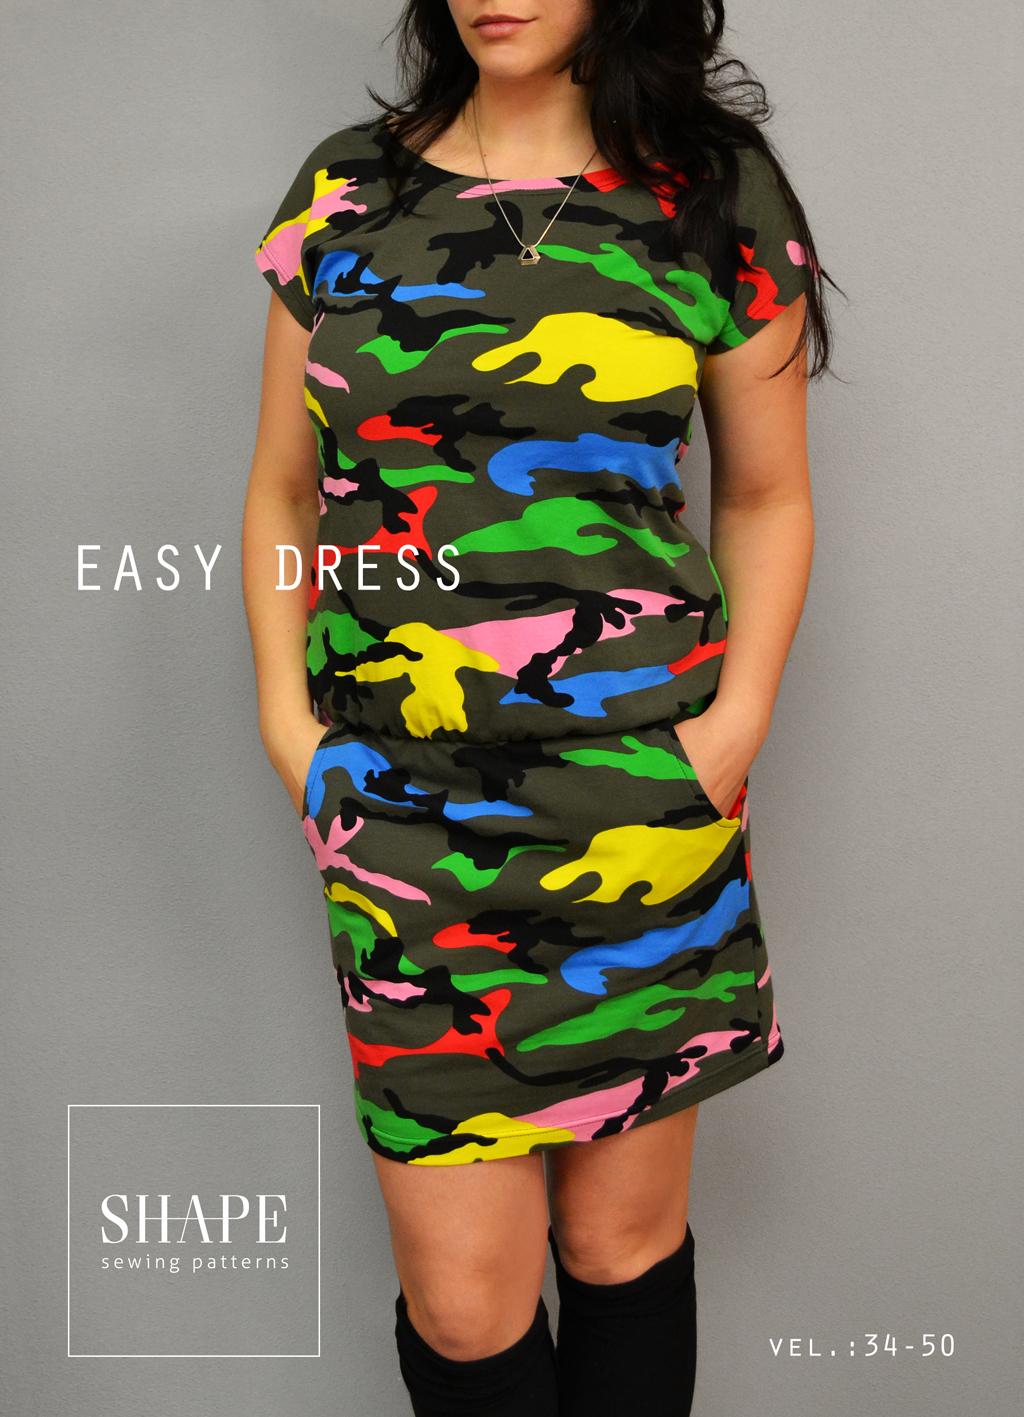 Návod na šití: střih easy dress